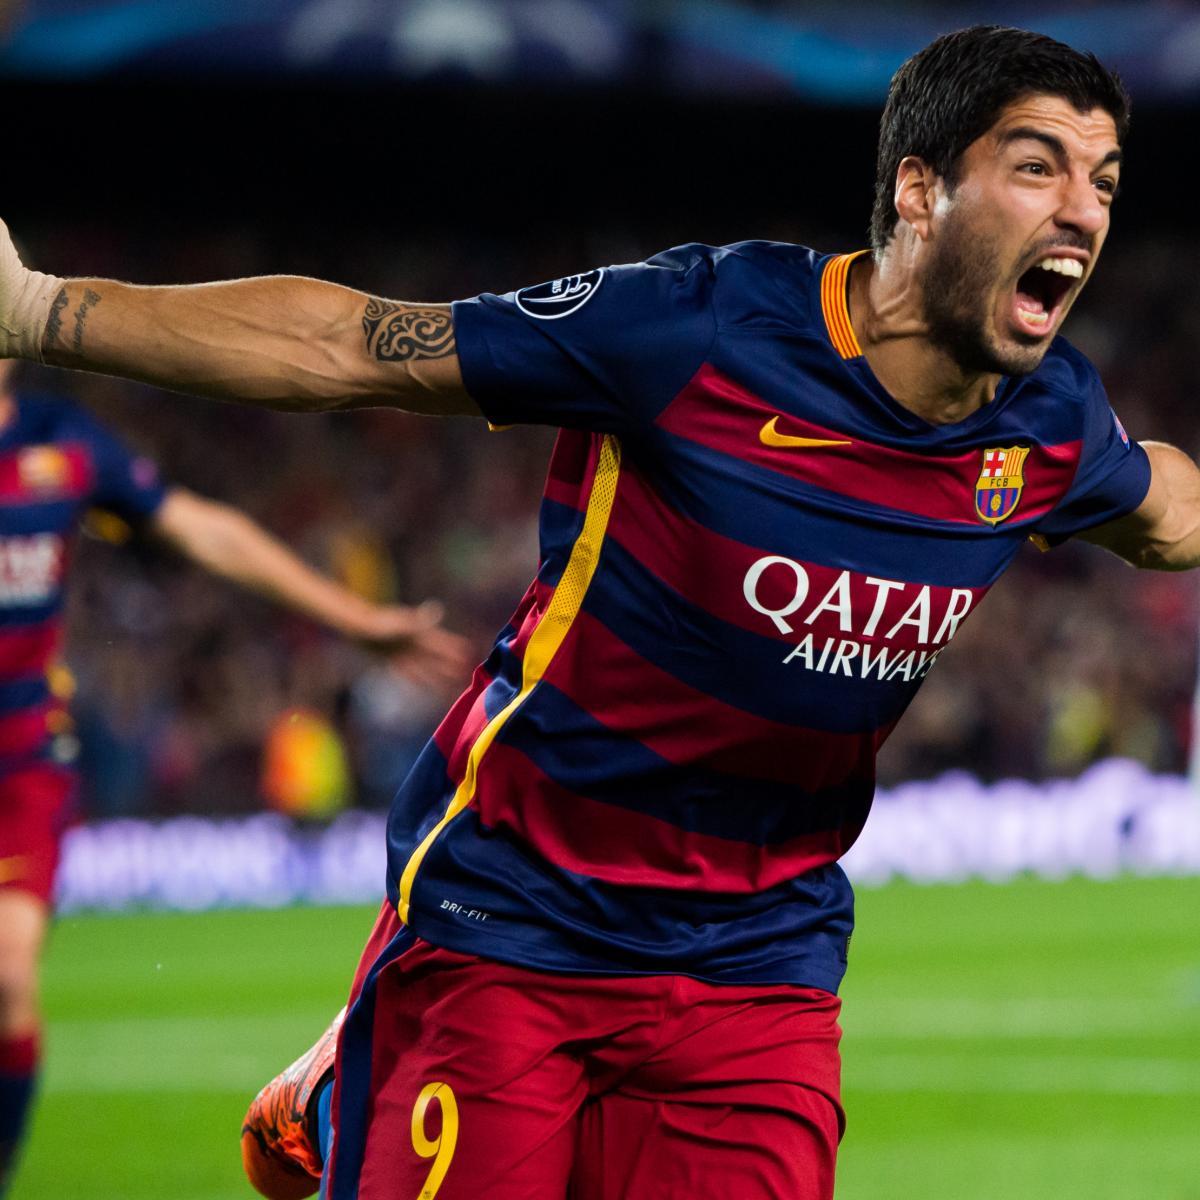 Sevilla Vs. Barcelona: Live Score, Highlights From La Liga